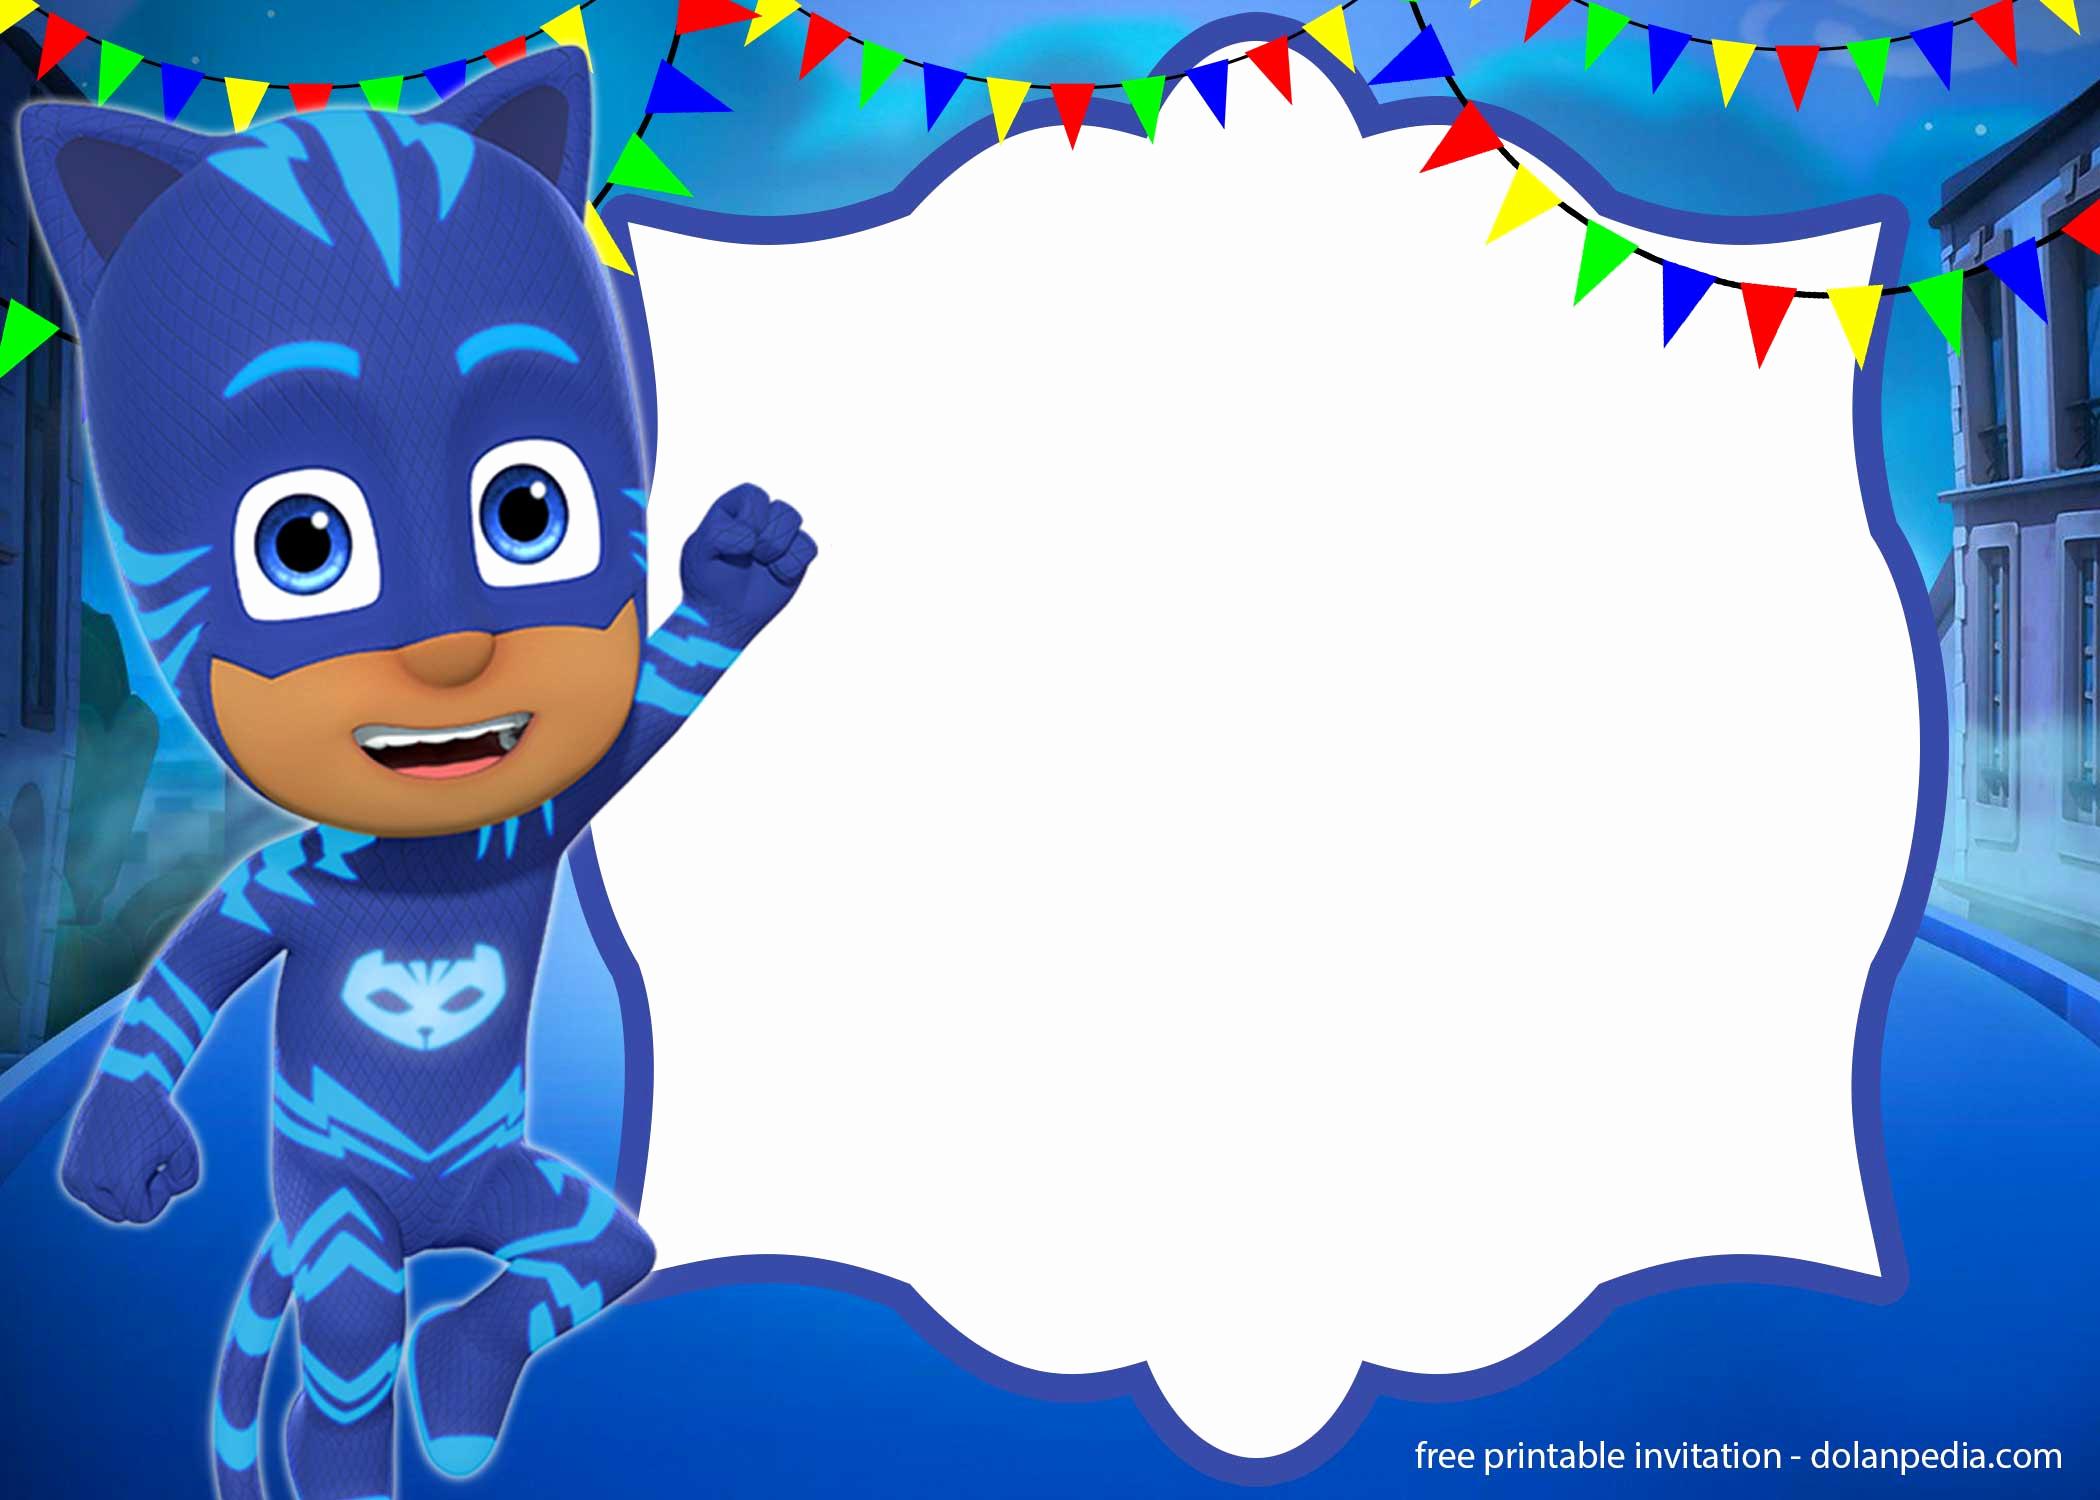 Pj Mask Invitation Free Fresh 9 Free Pj Masks Birthday Invitation Templates – Updated